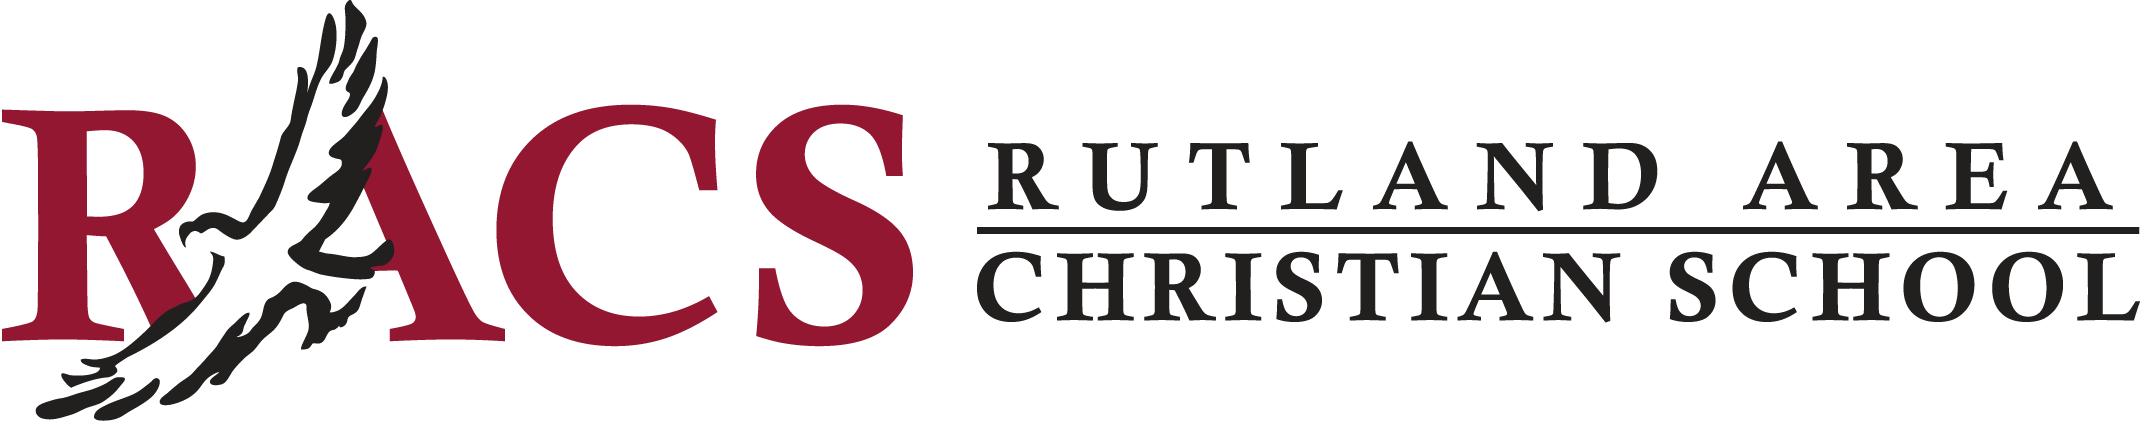 Rutland Area Christian School